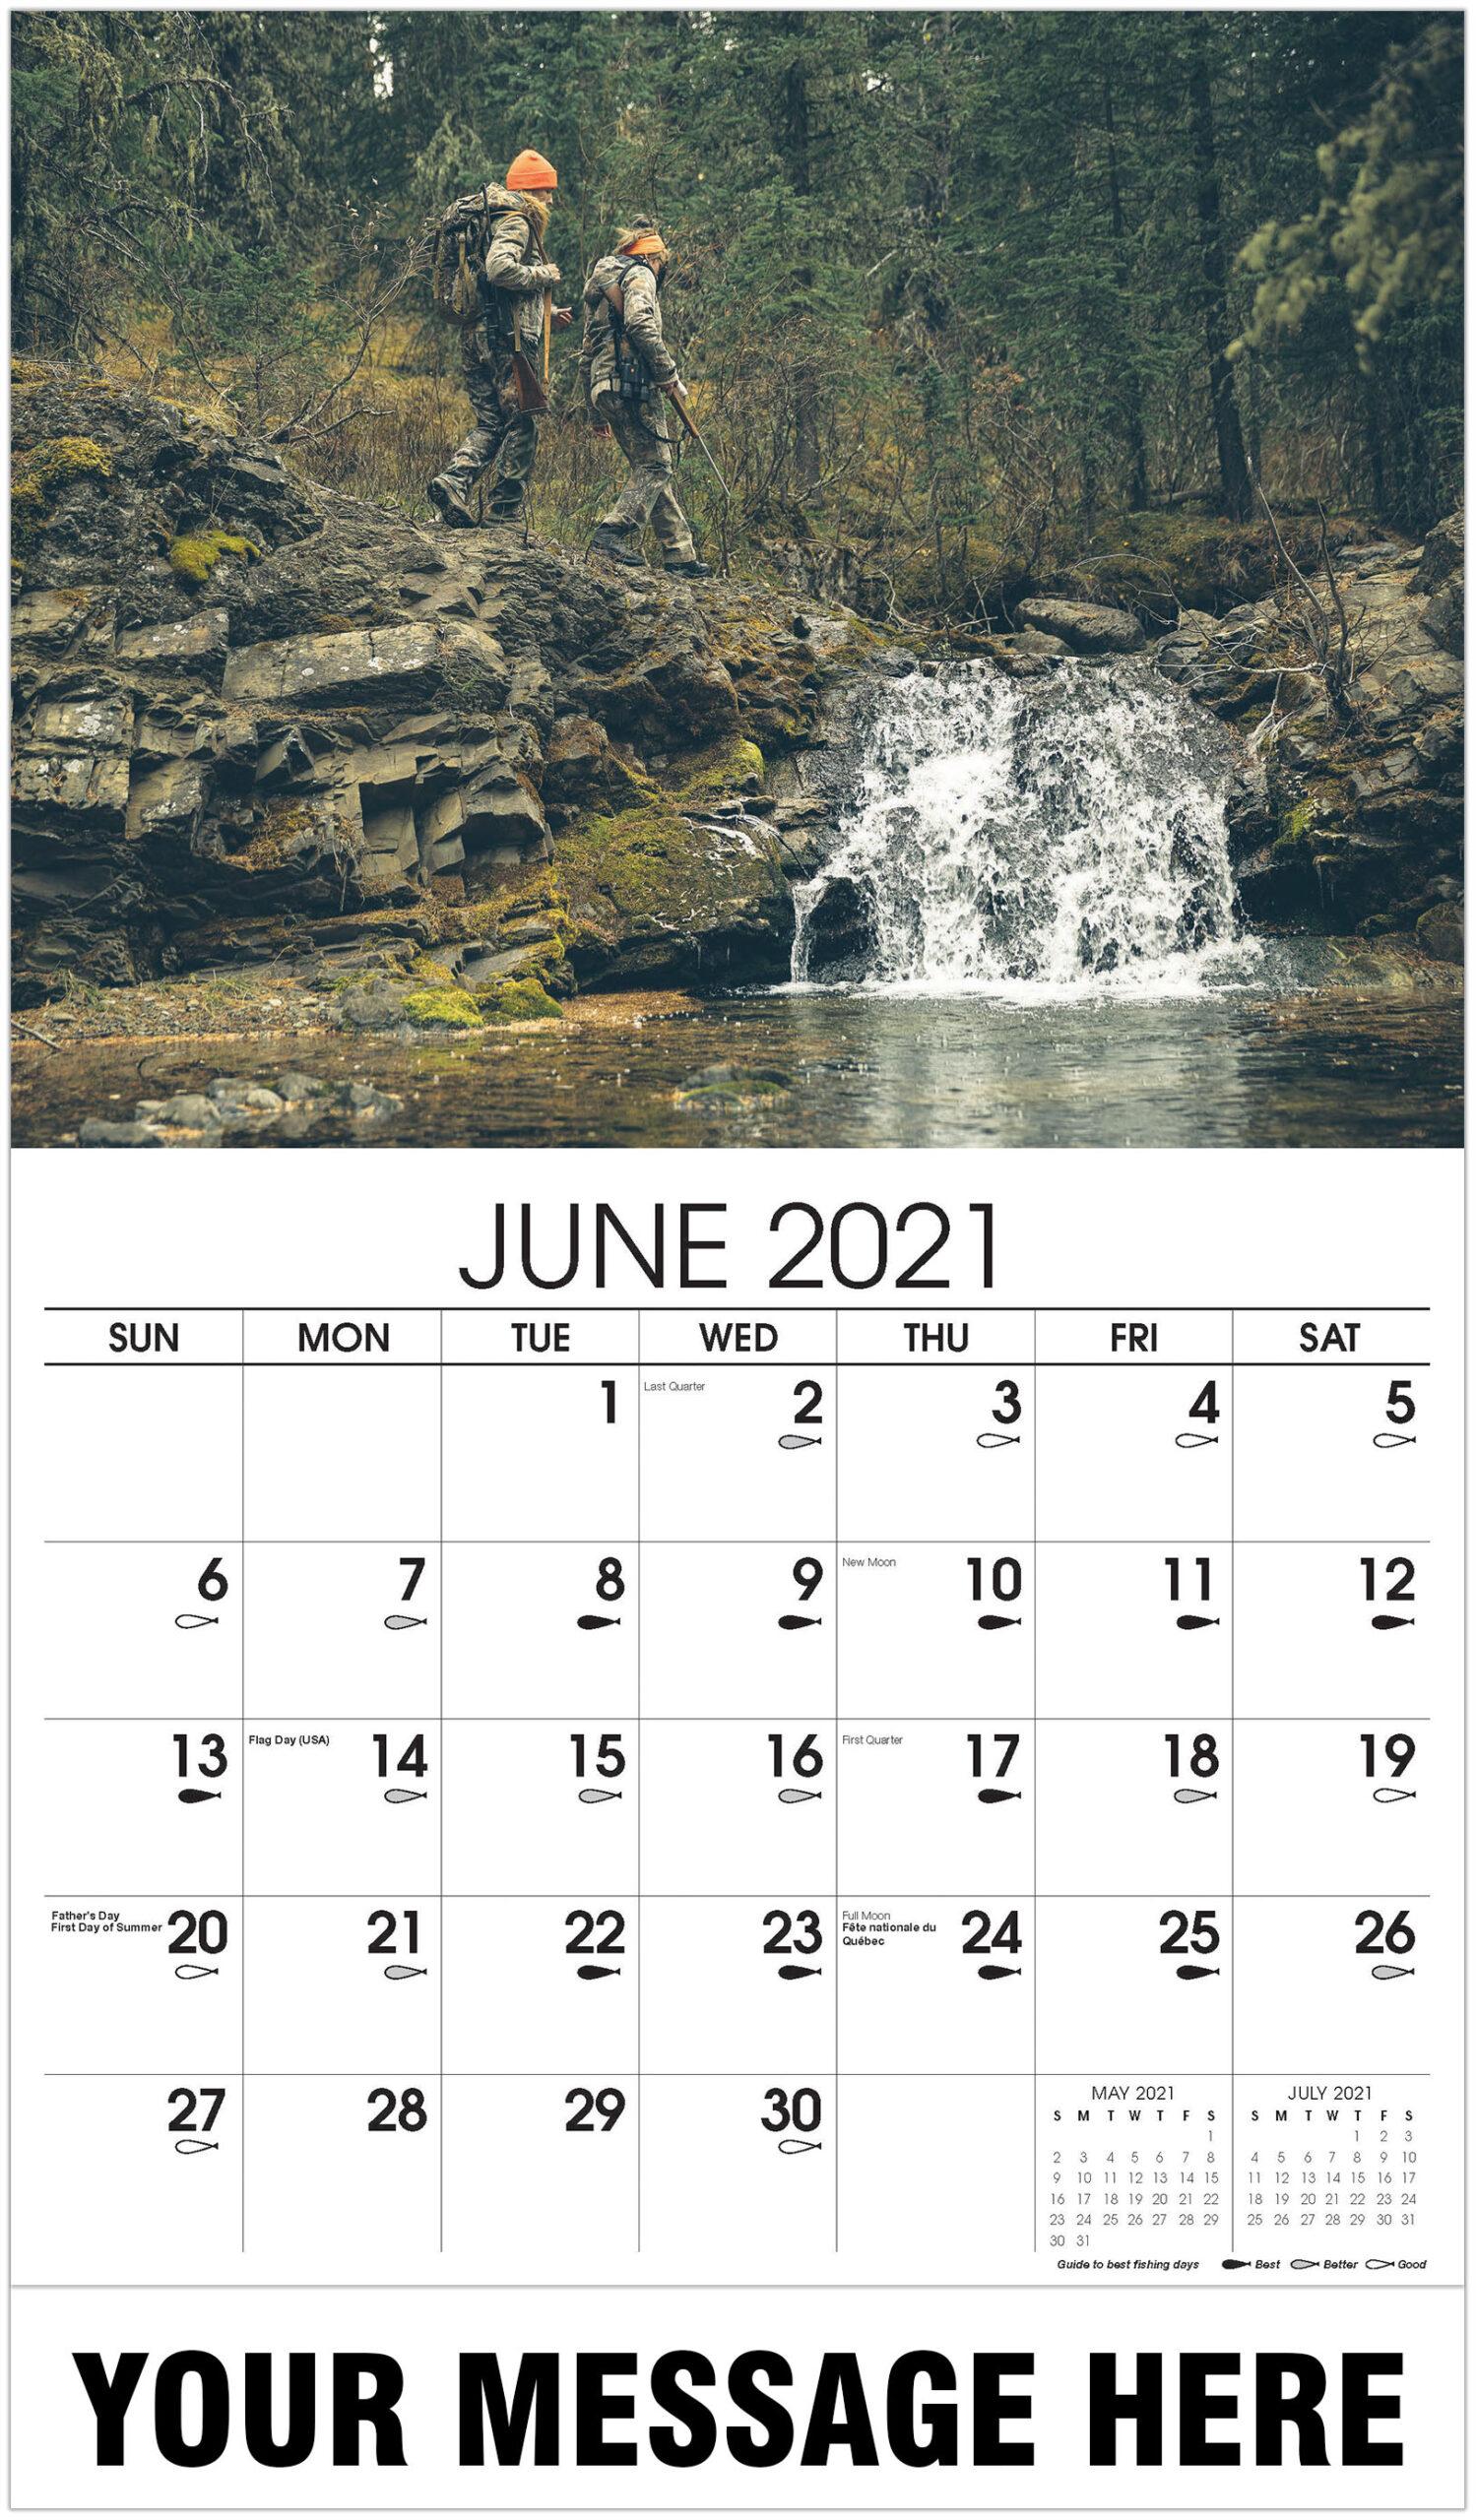 Fishing & Hunting within Hunting Calendar 2021